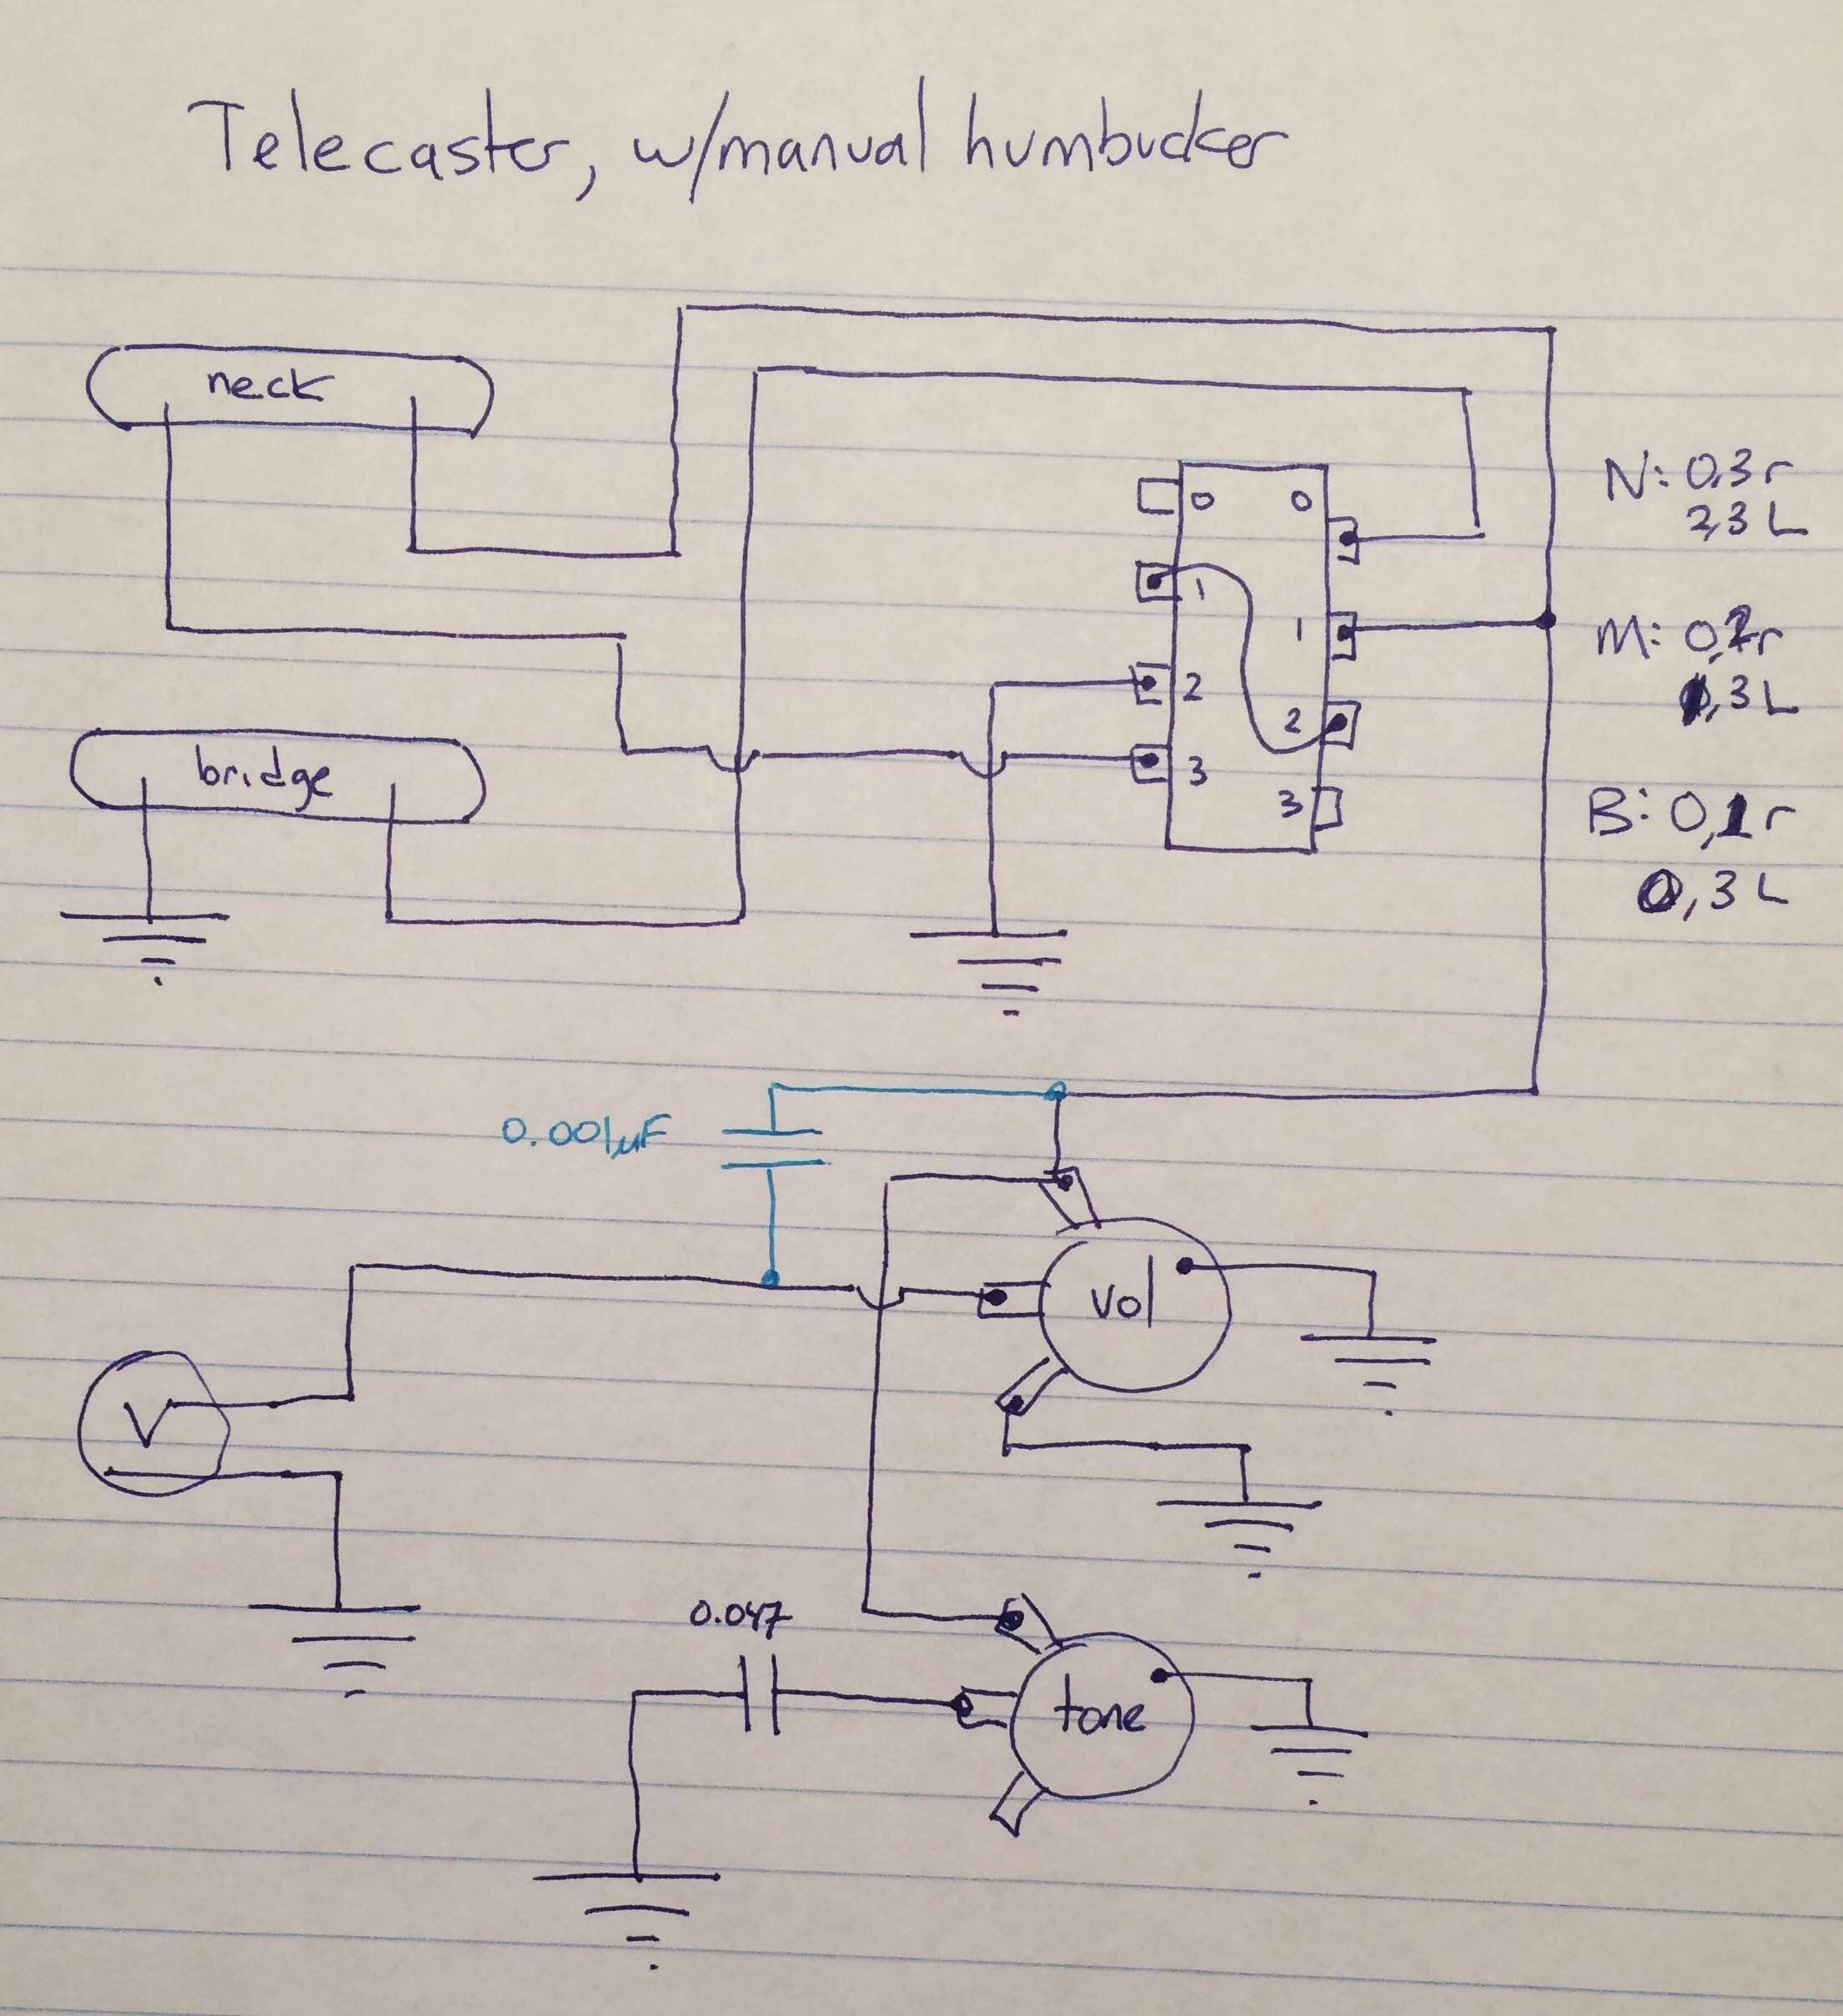 Duncan Design Wiring Diagram Telecaster Schematic Diagrams Seymour Automanualparts Guitar 2 Guitarhacking Hamer